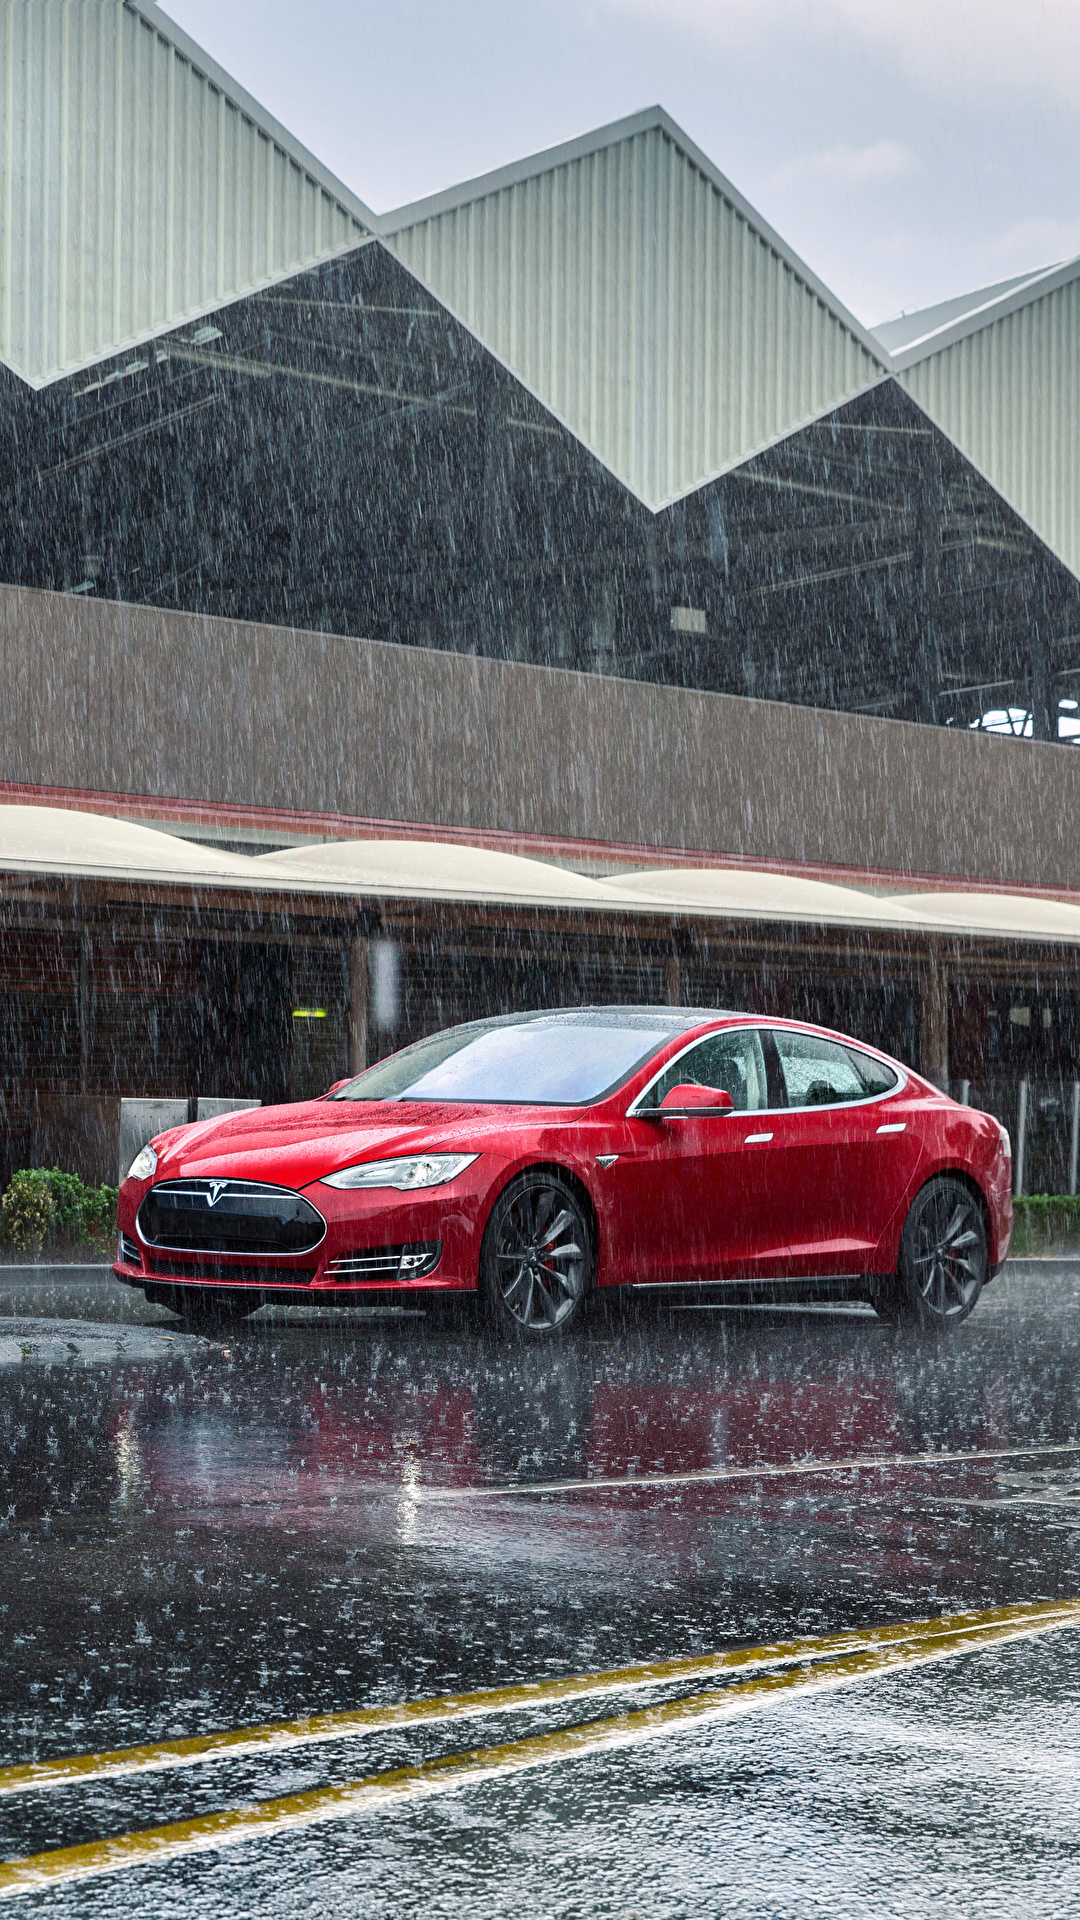 Wallpaper Tesla Motors 2012 14 Model S P85 Red Rain 1080x1920